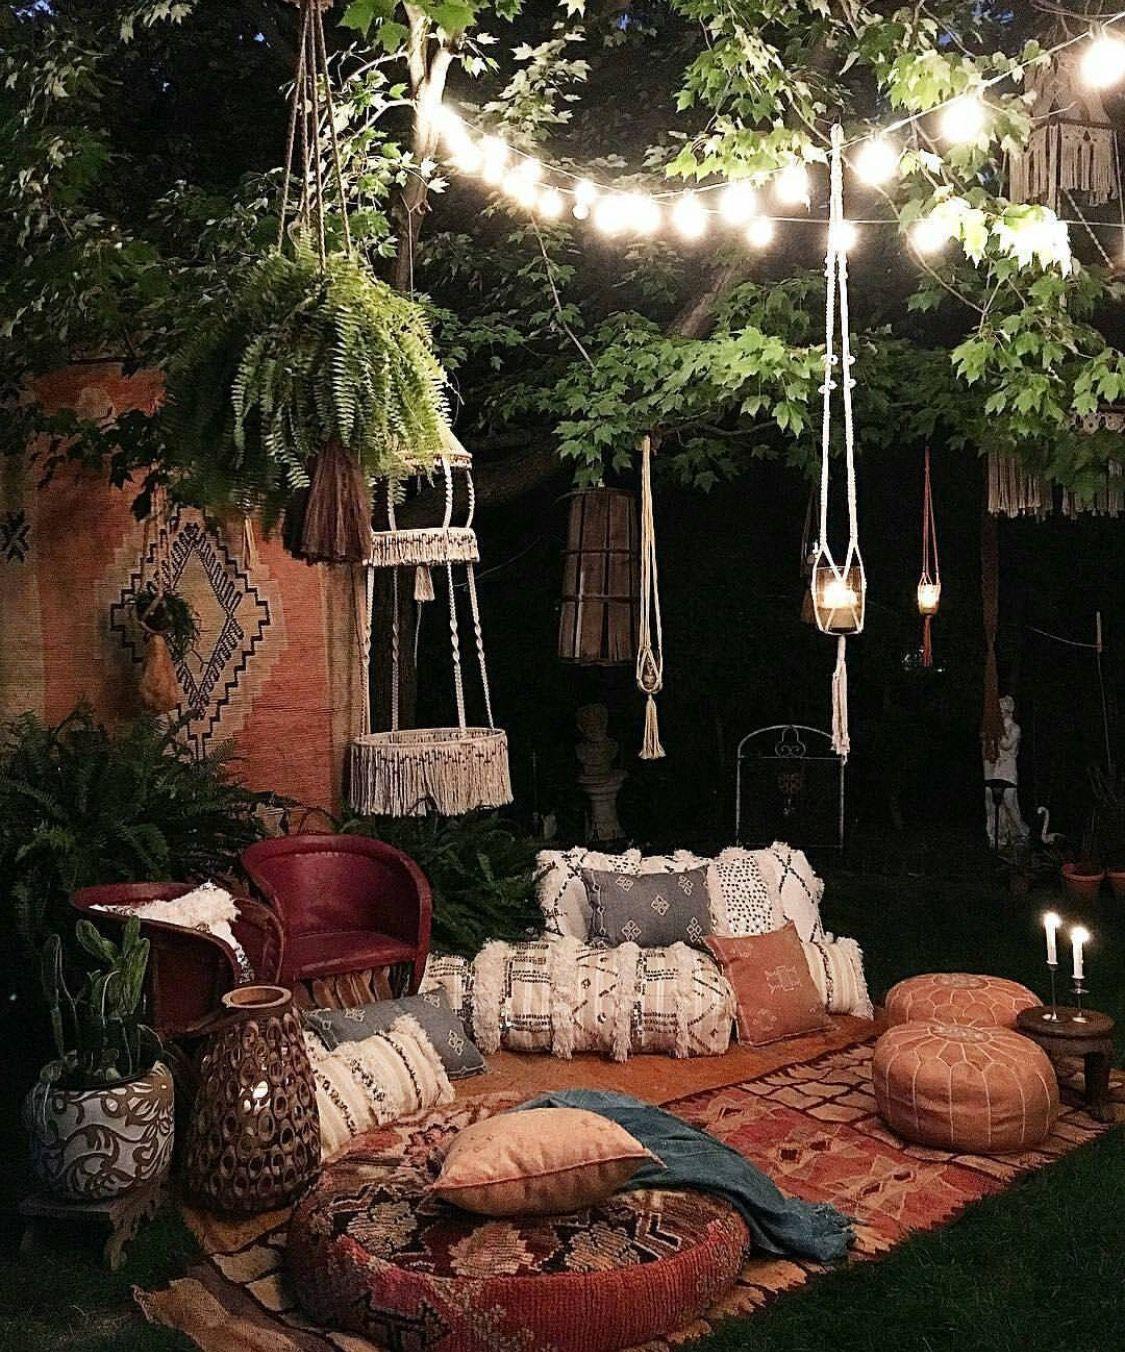 outdoor decor #outdoor #decor#nature VAPXBLP